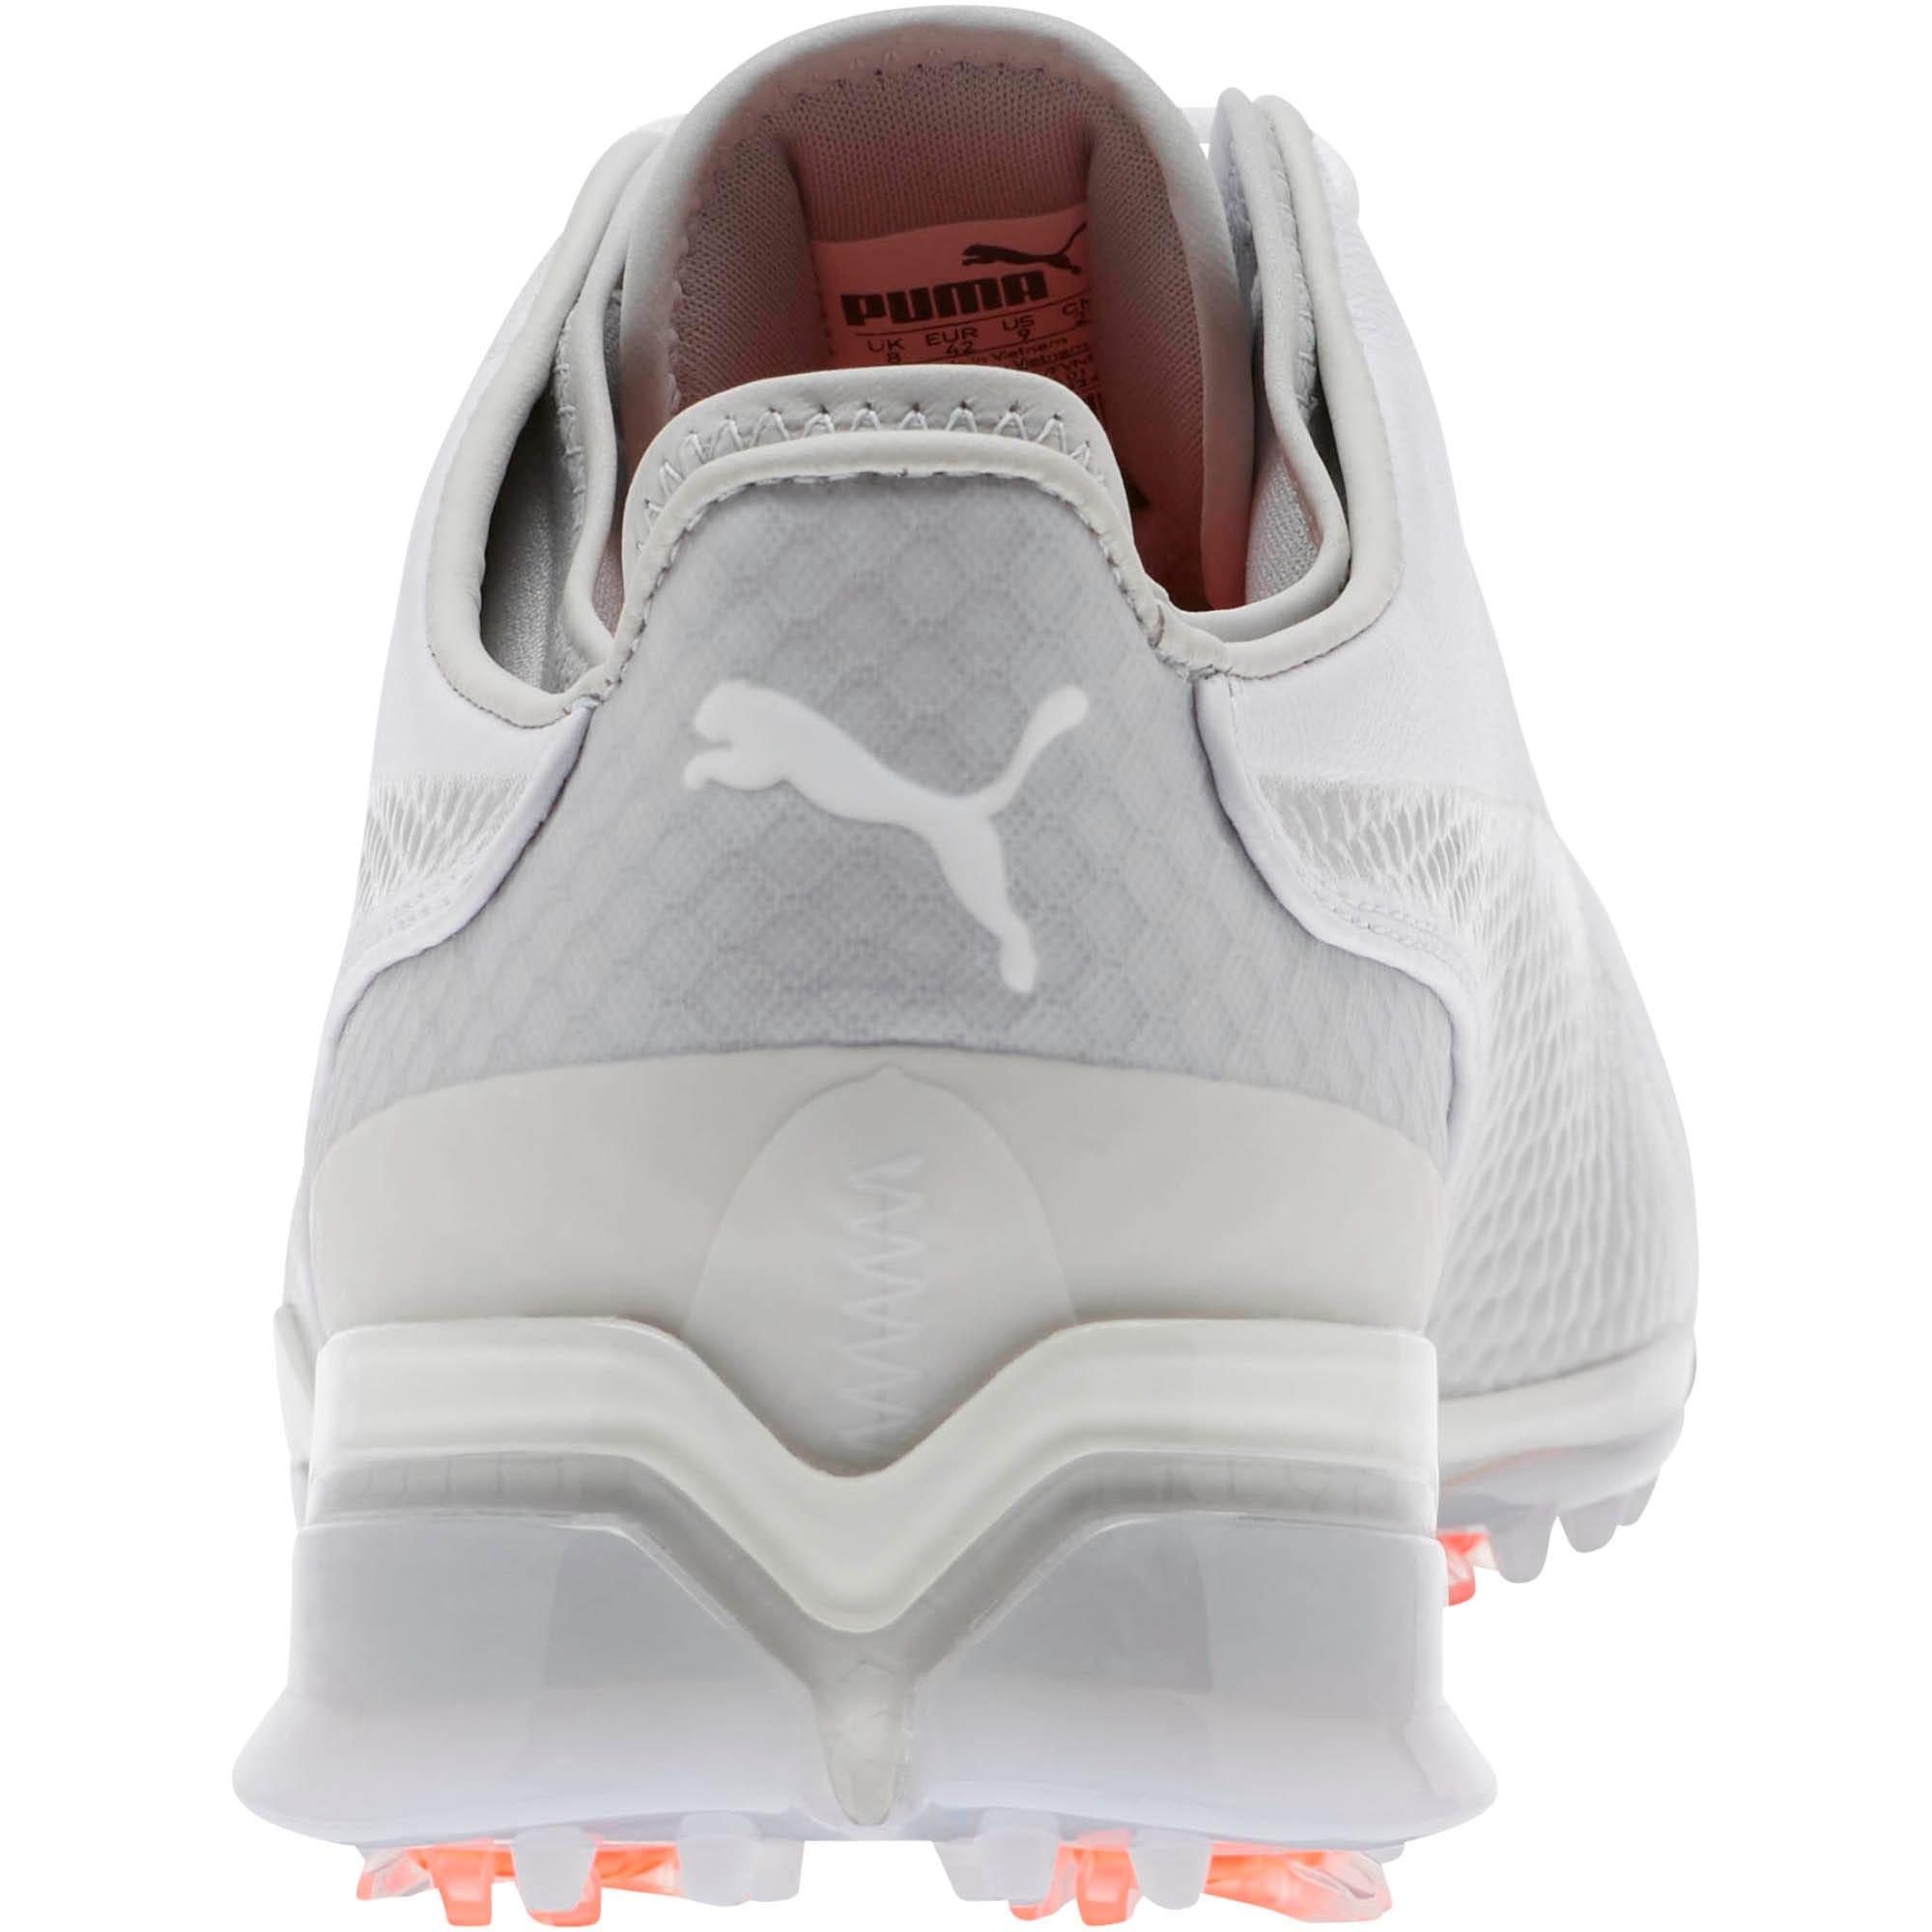 Thumbnail 3 of IGNITE PROADAPT Men's Golf Shoes, White-Gray Violet, medium